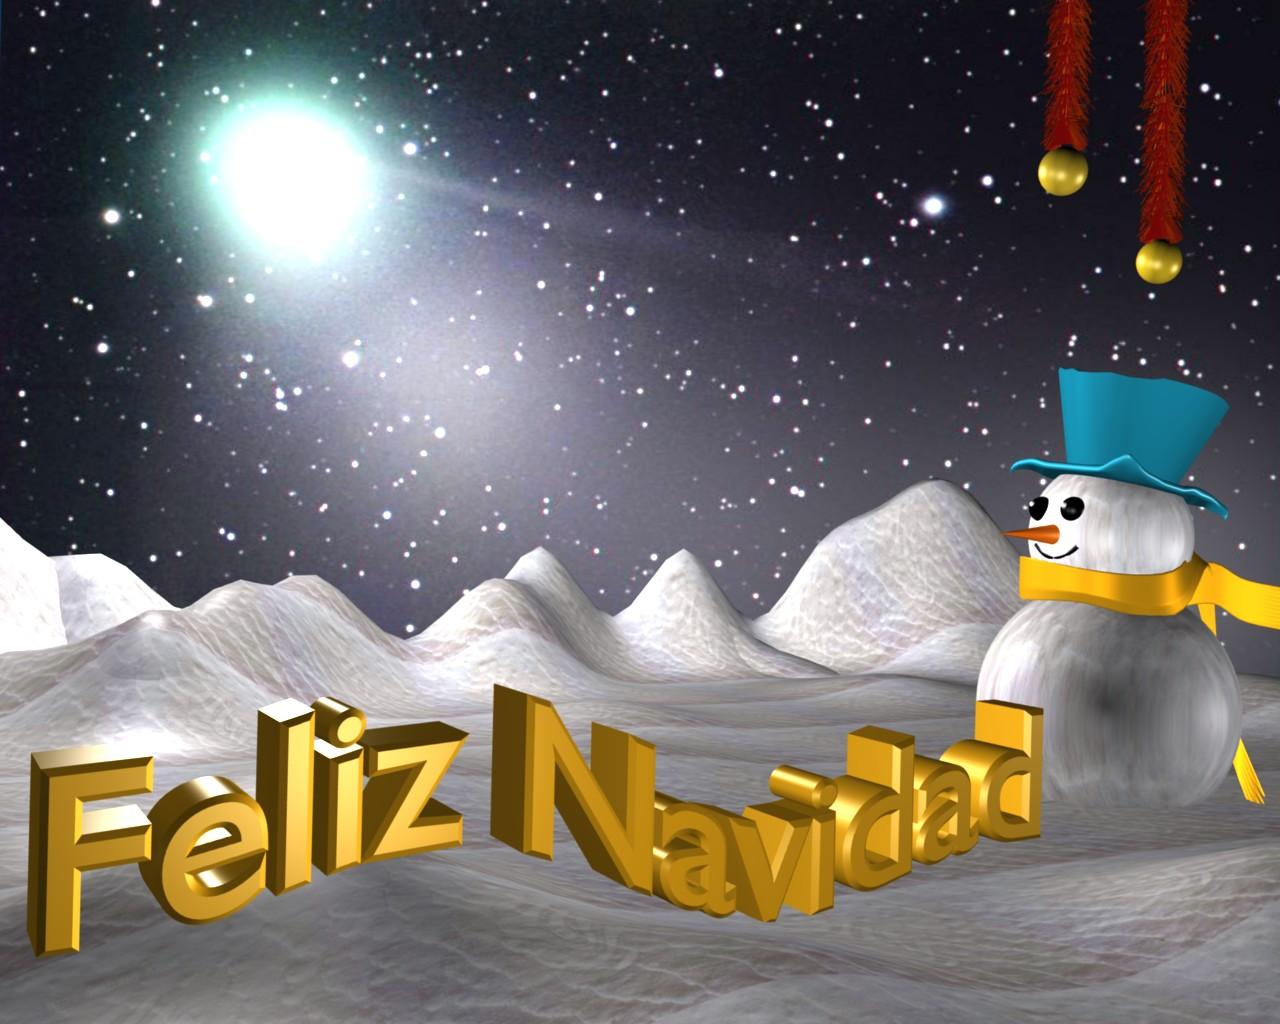 Wallpaper navidad viii alumnos blogs experimentales - Paisaje nevado navidad ...